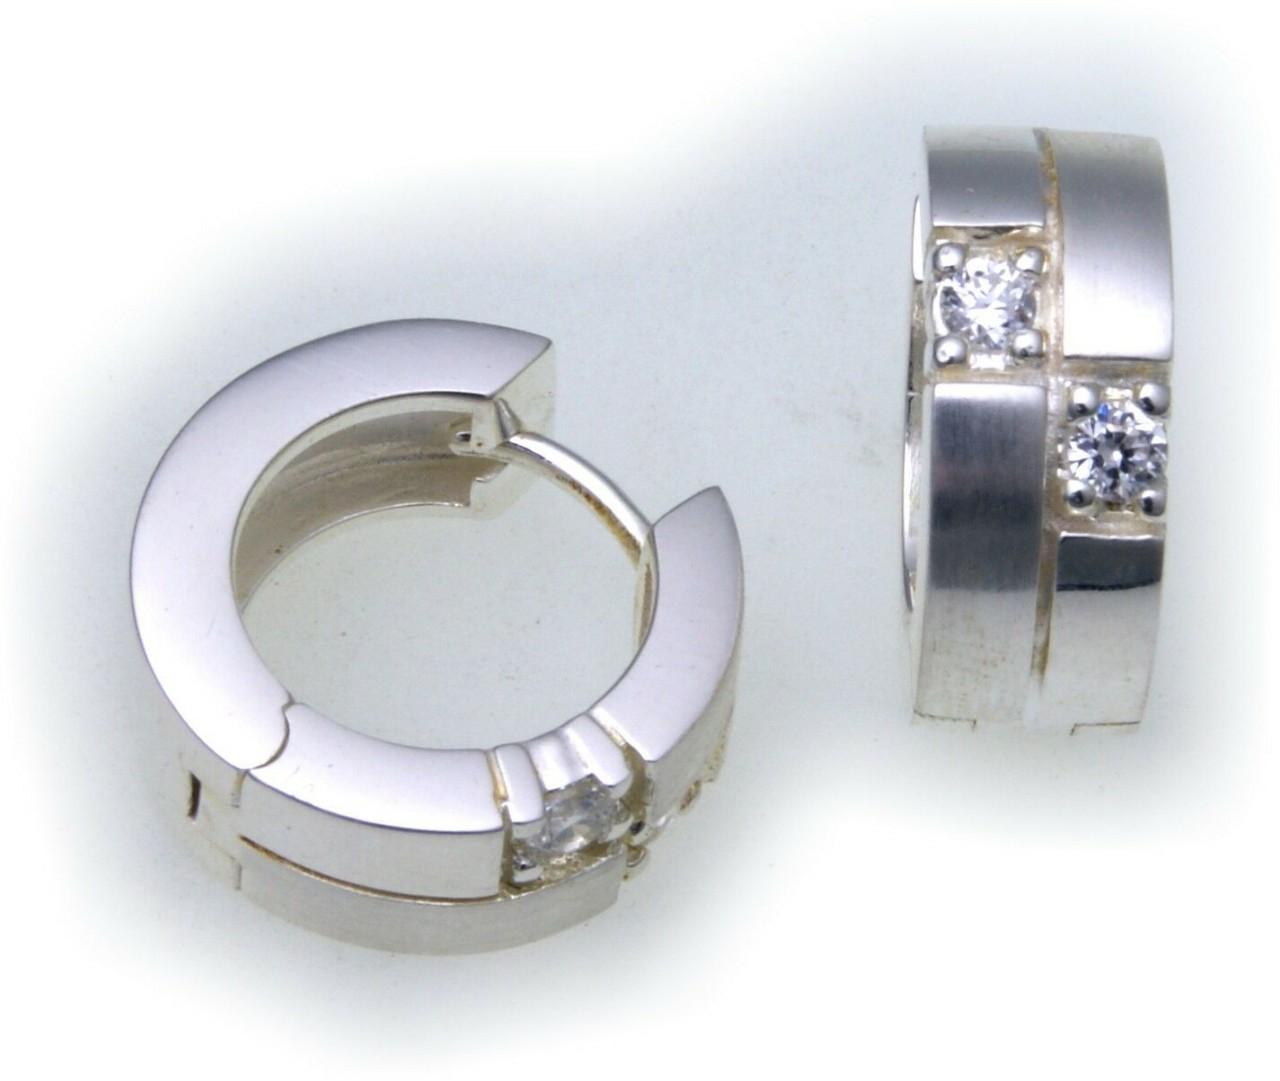 edle Ohrringe Klapp Creolen Zirkonia echt Silber 925 Sterlingsilber Qualität